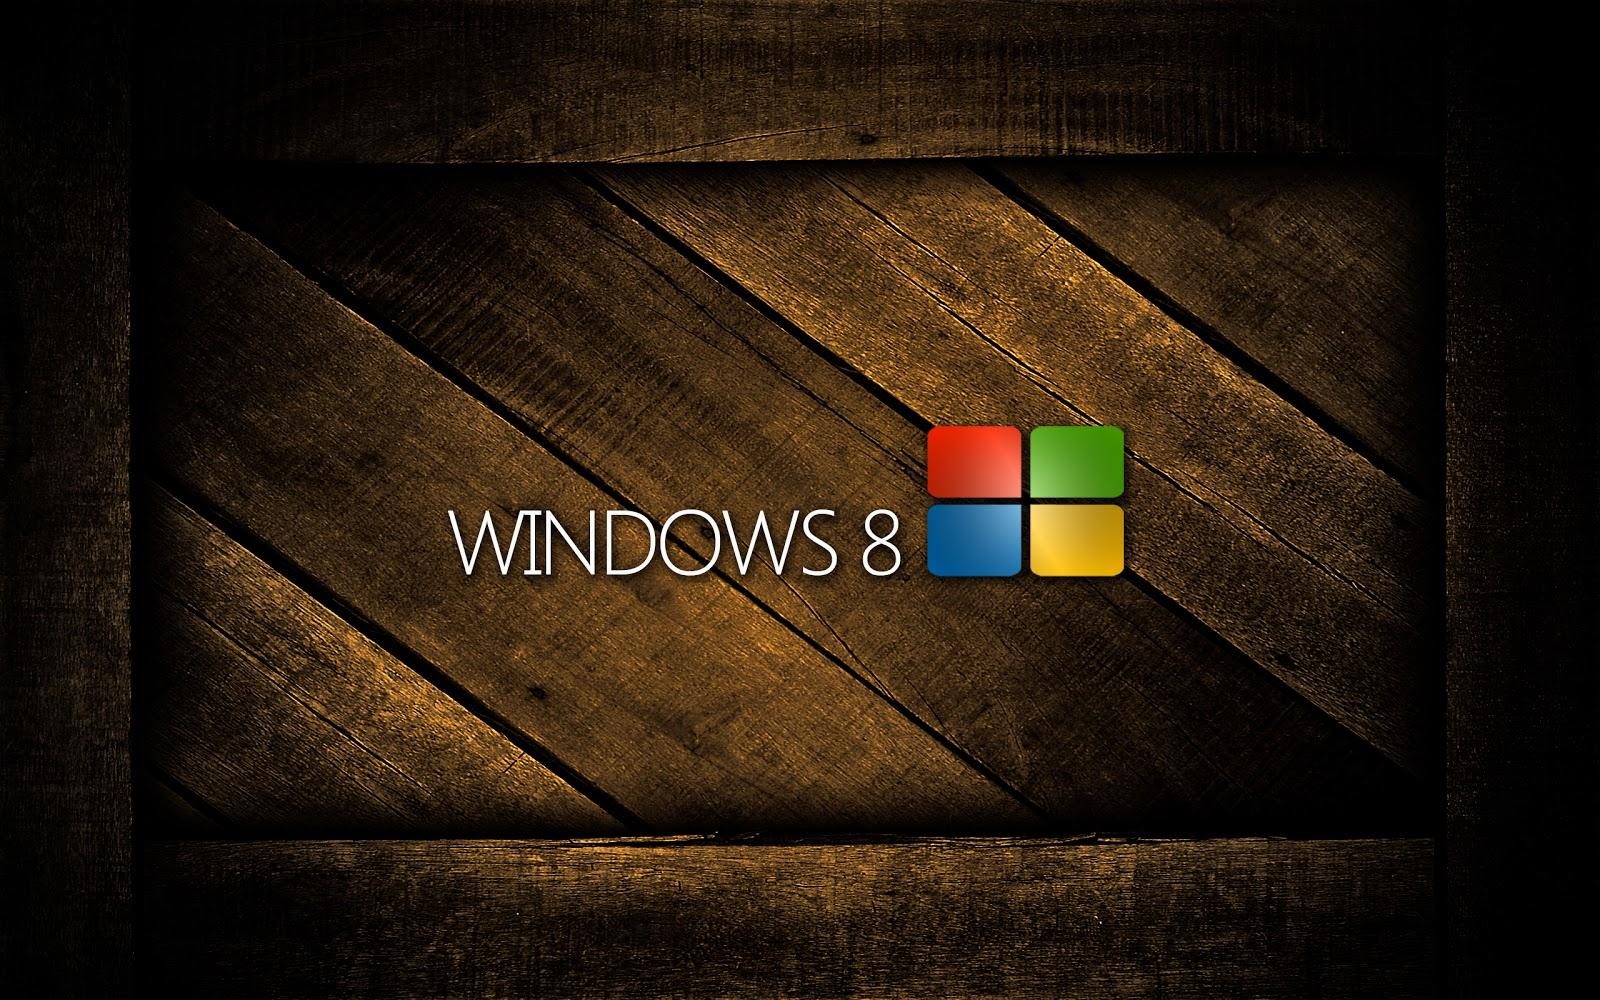 wallpaper downloads windows 8 hd wallpapers download 1600x1000